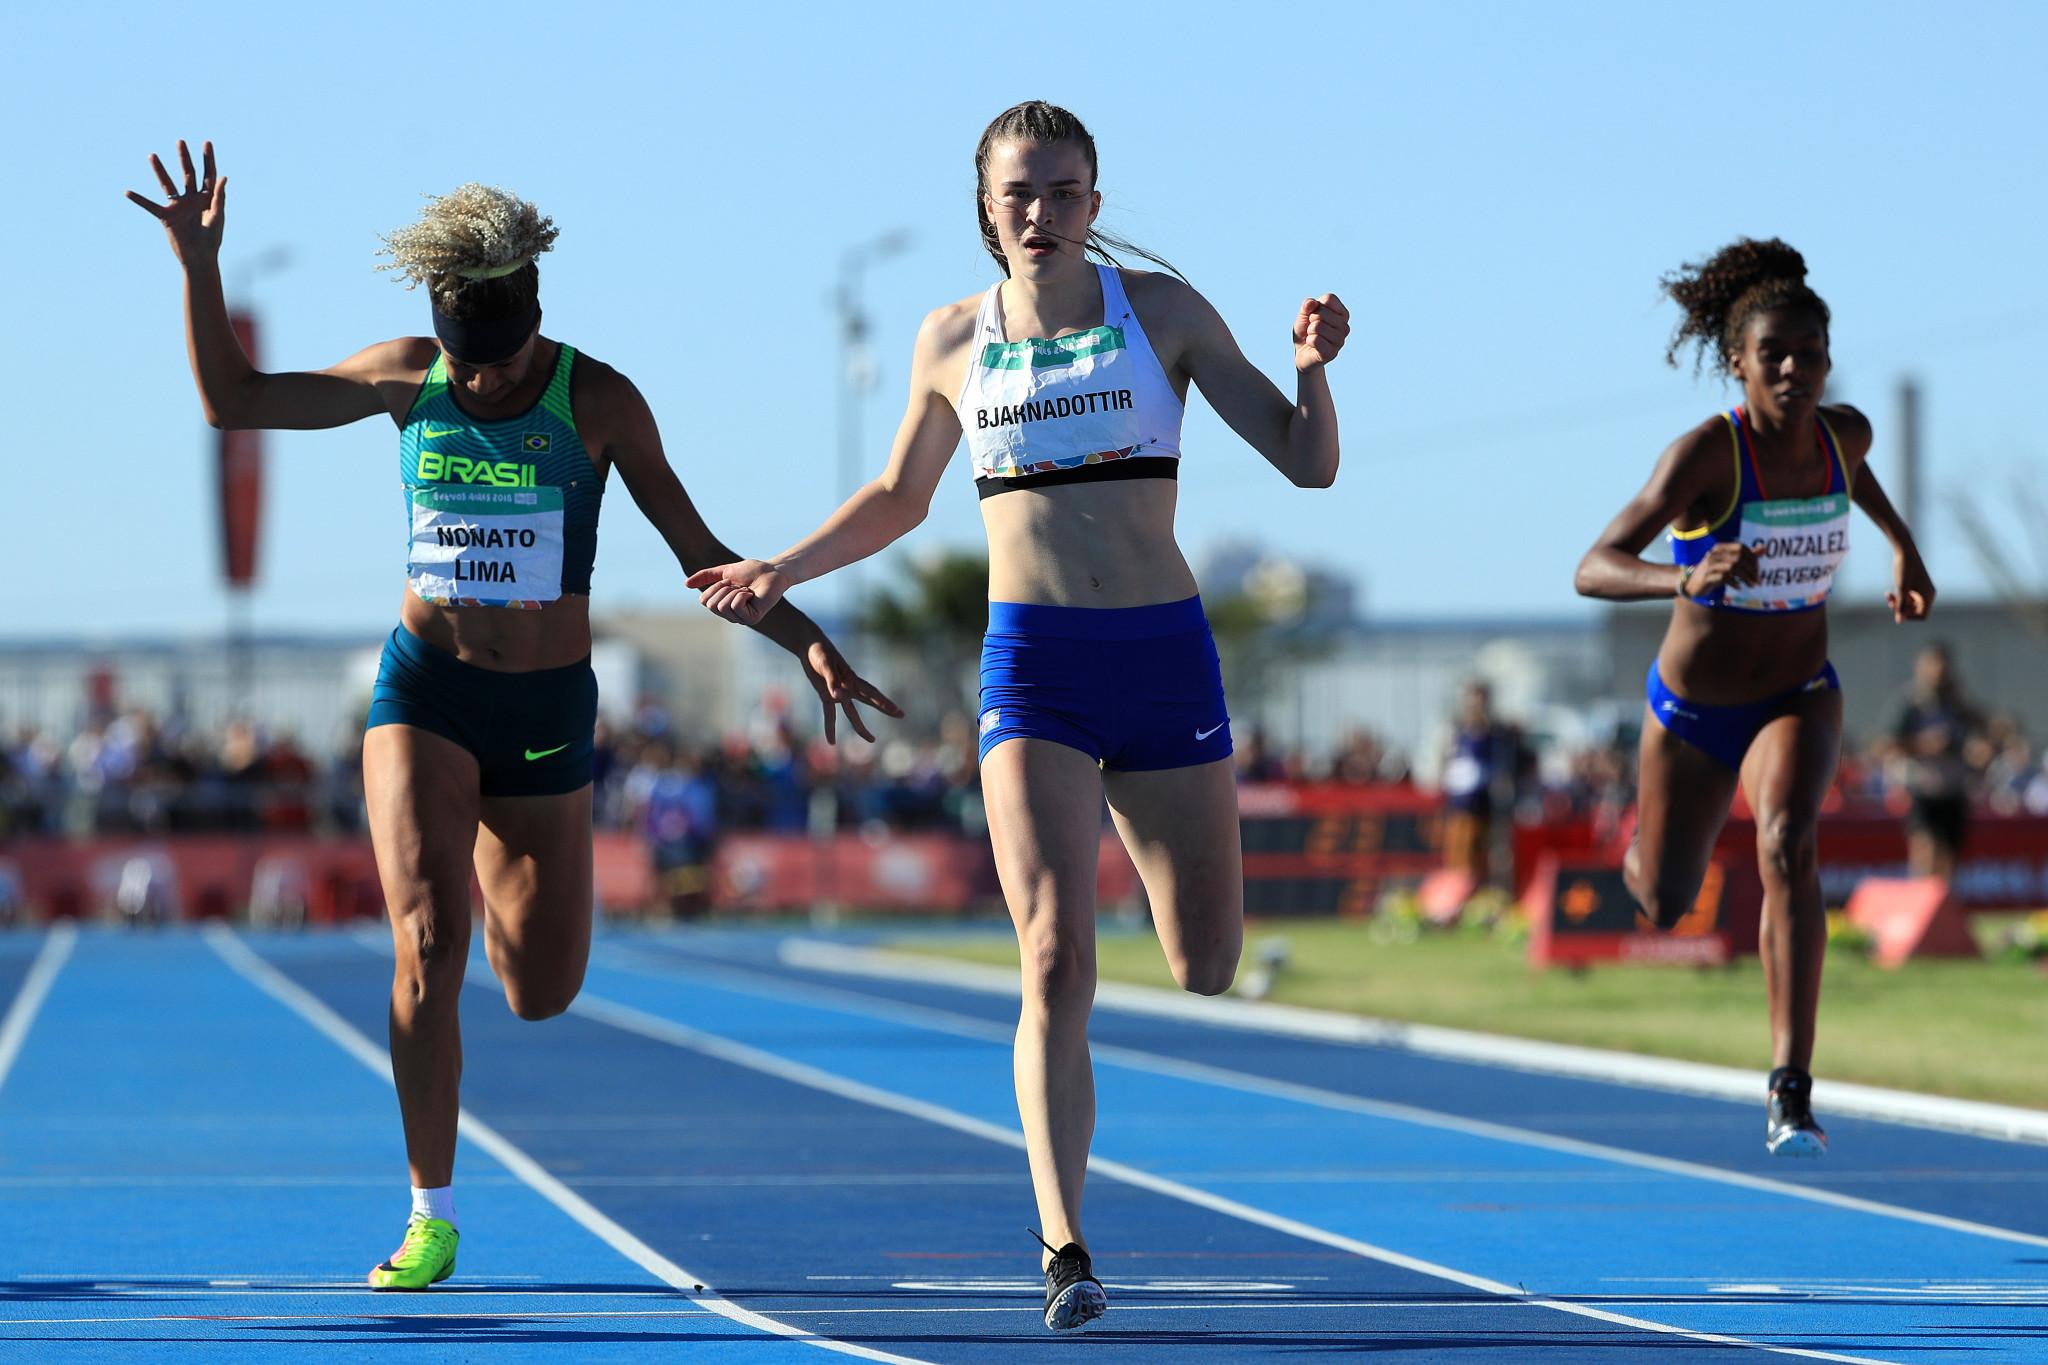 Iceland's Guðbjörg Bjarnadóttir won the women's 200m event ©Getty Images